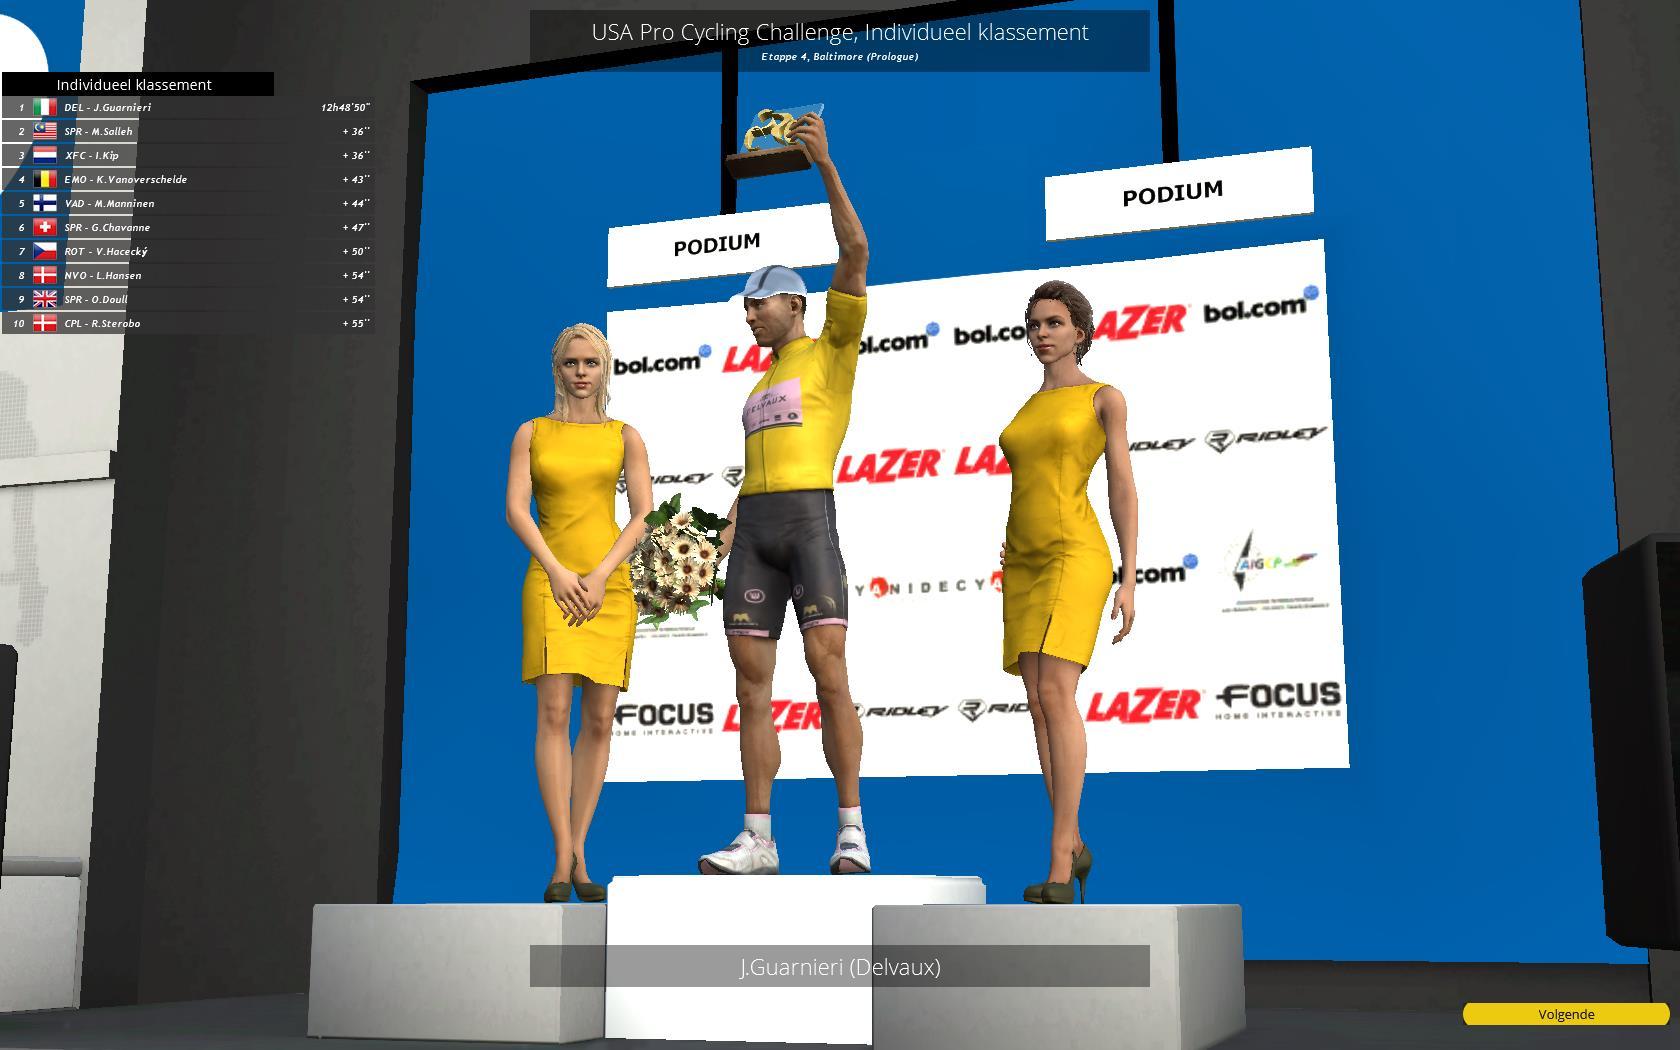 pcmdaily.com/images/mg/2018/Races/C2/USAPCC/4/PCM0042.jpg